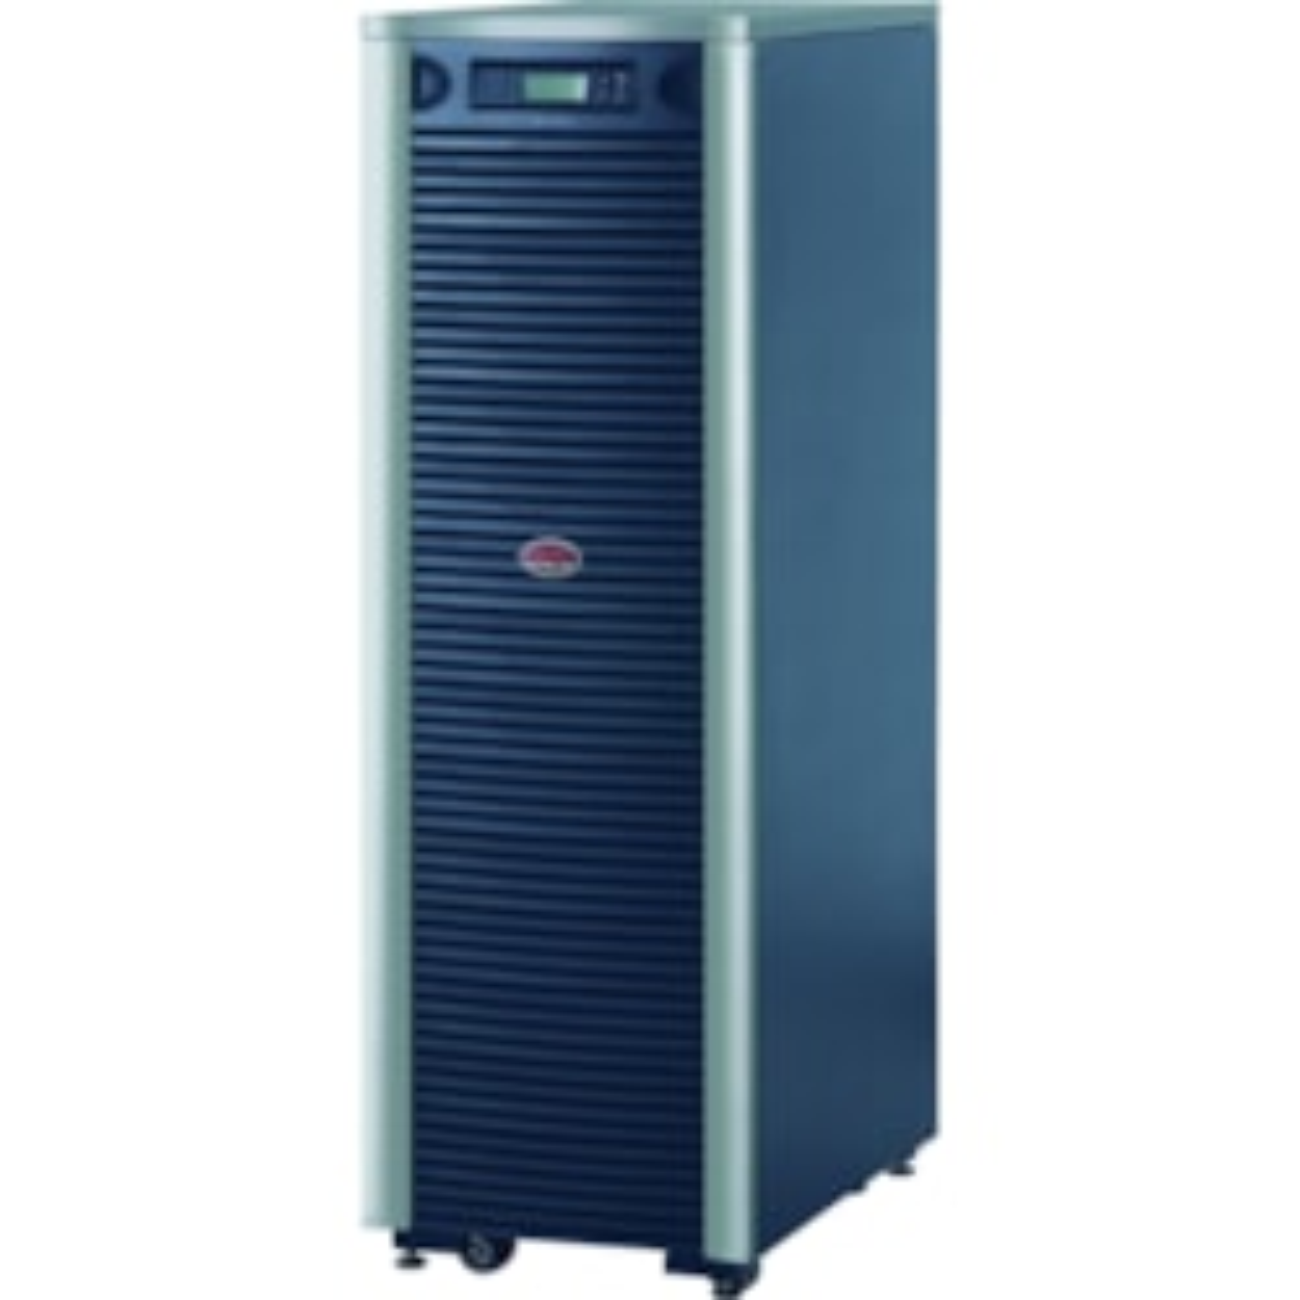 APC by Schneider Electric Symmetra SYA12K16IXR Dual Conversion Online UPS